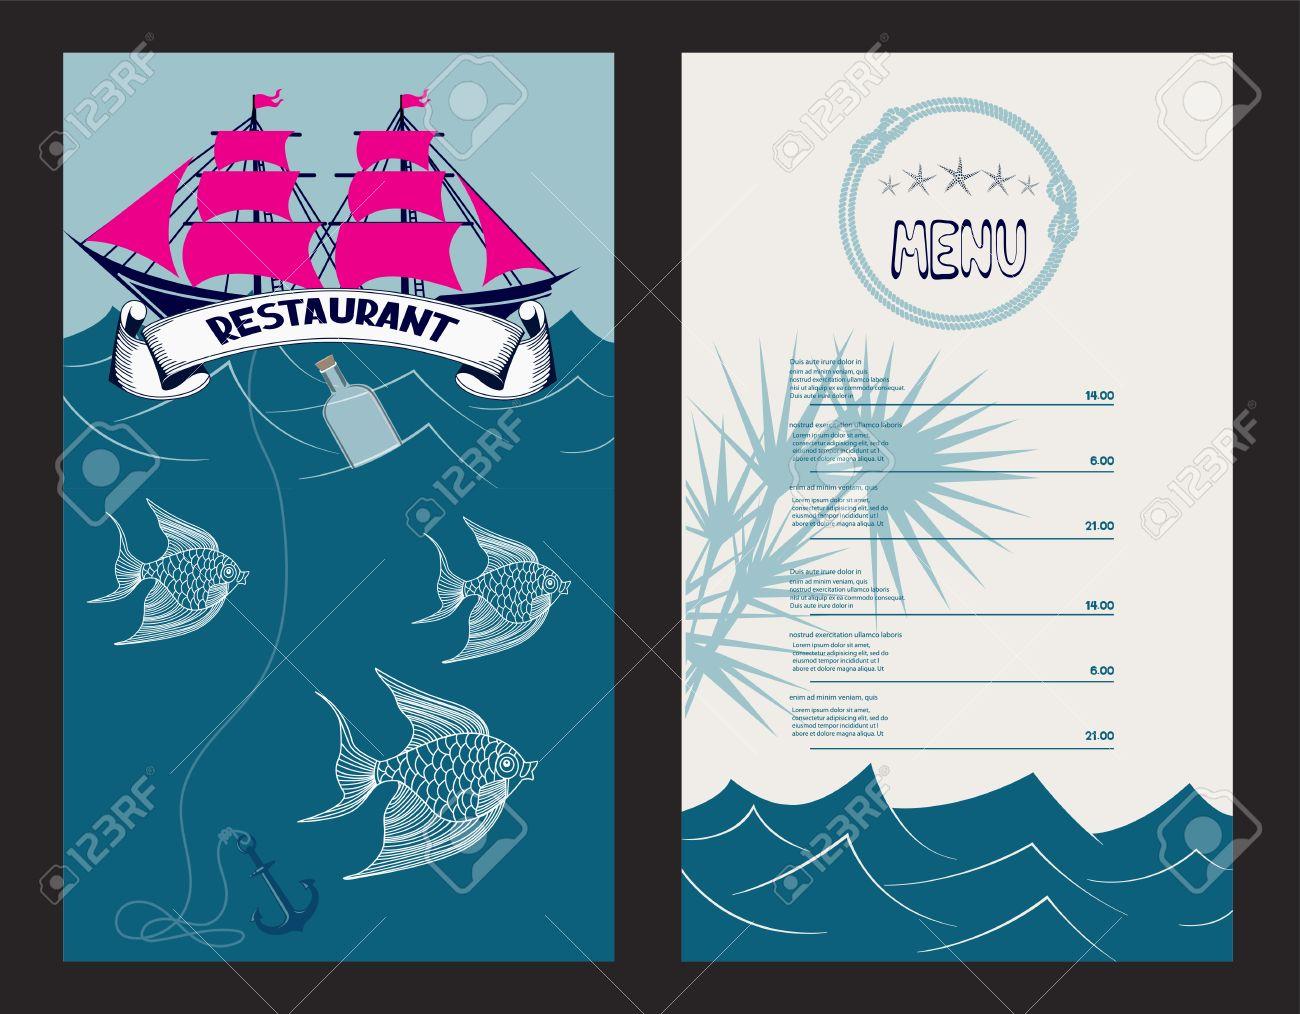 restaurant menu background with marine design elements. seafood